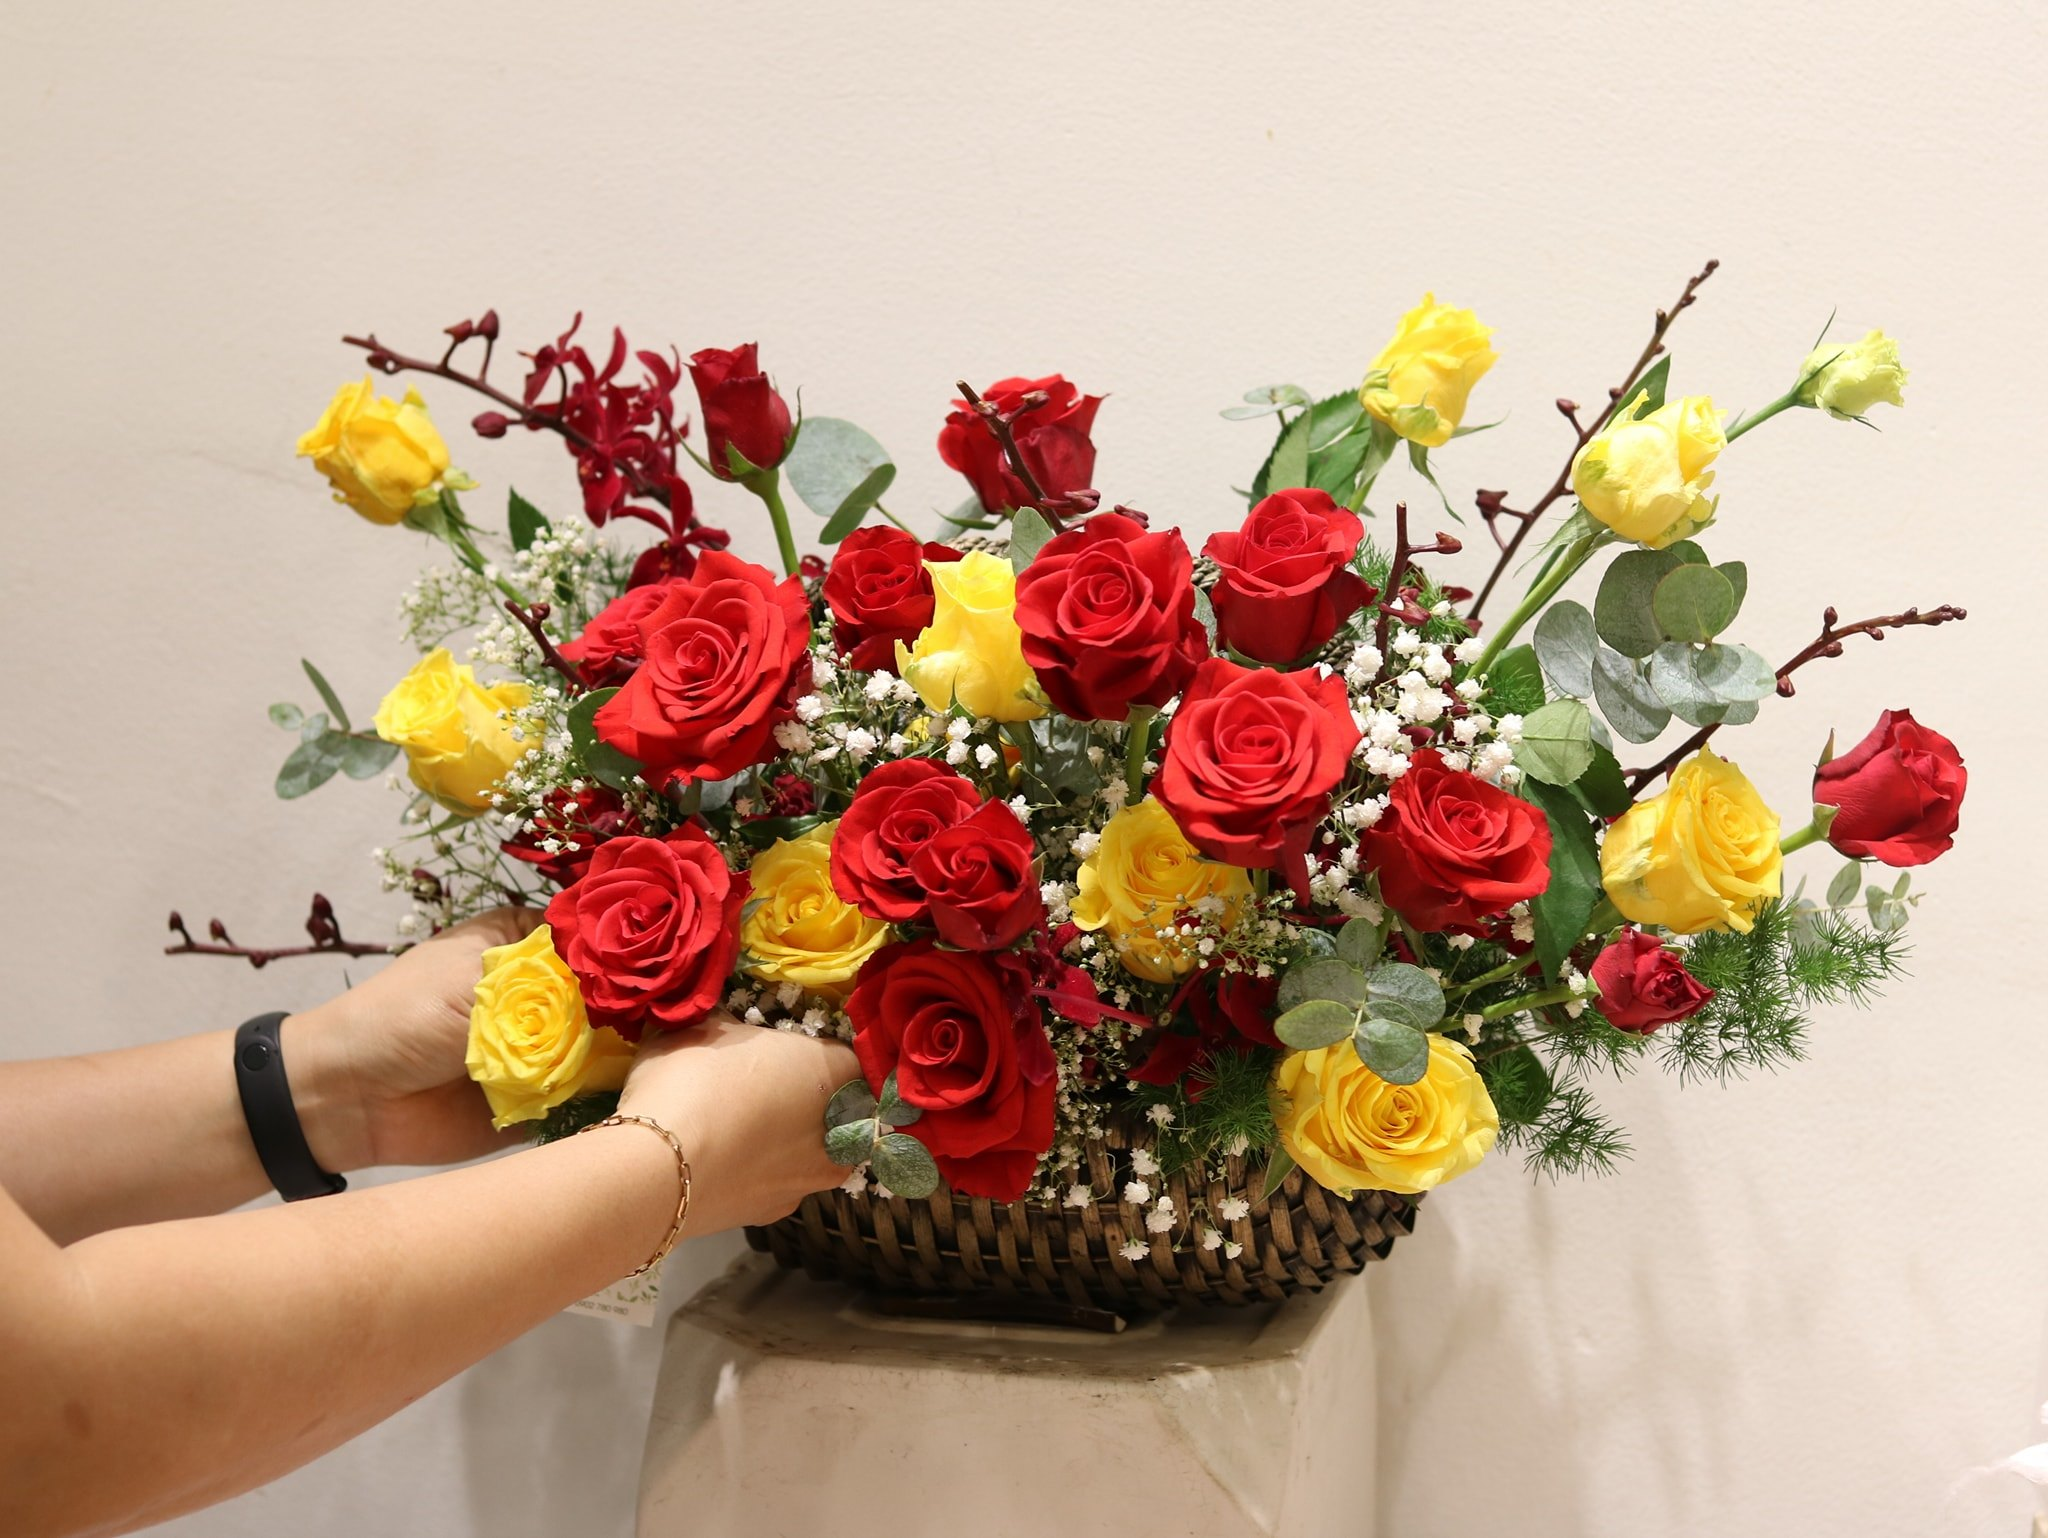 Giỏ hoa tặng hoa sinh nhật đẹp